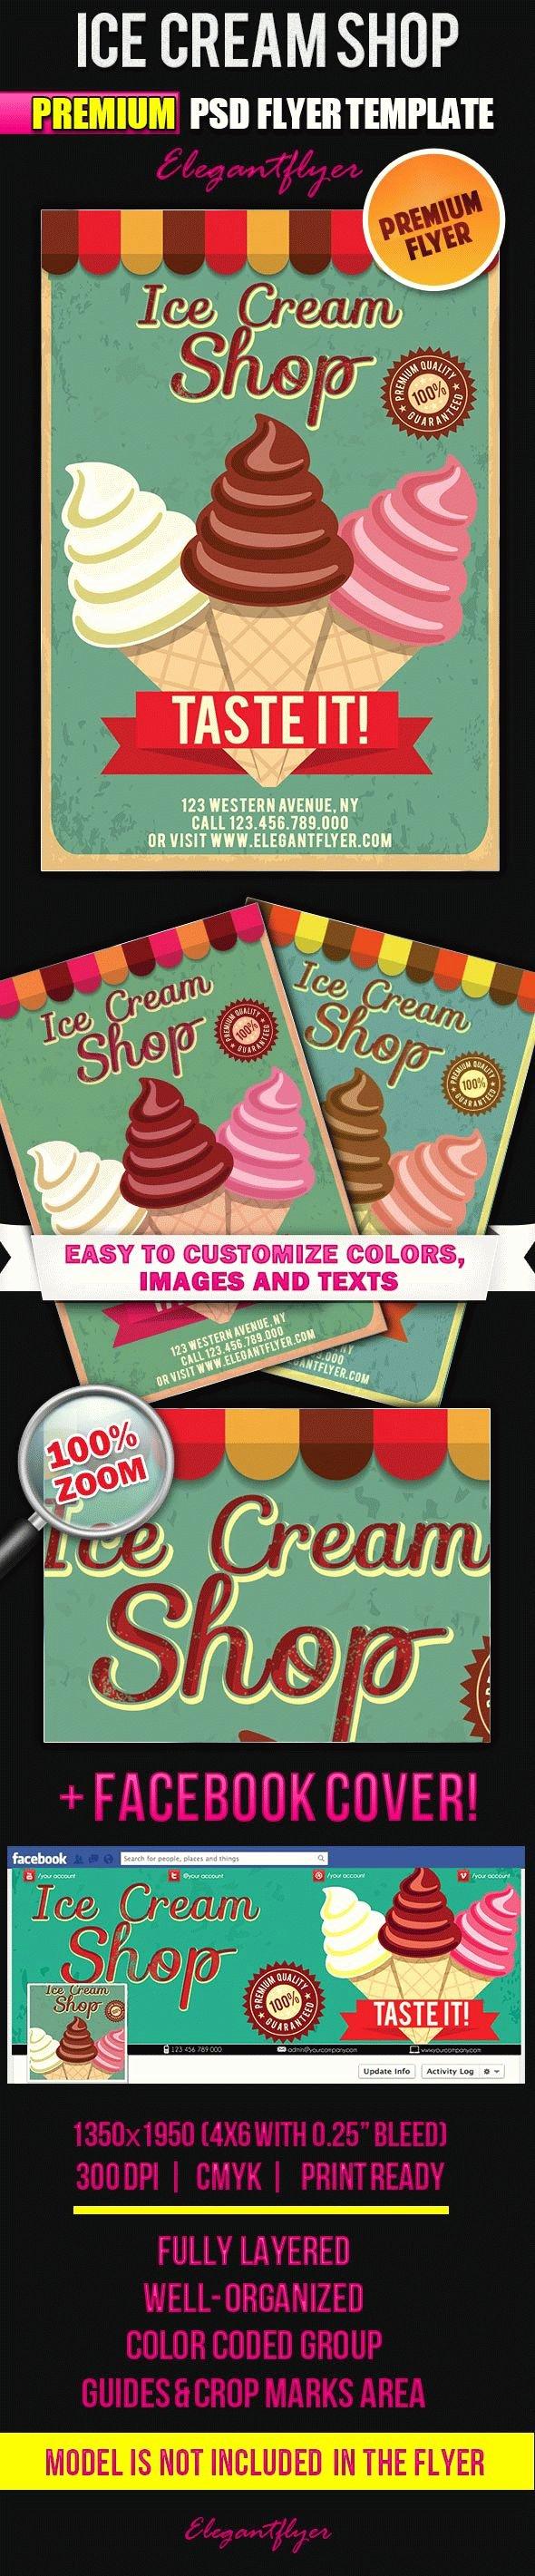 Ice Cream social Flyer Template Free Luxury Ice Cream Shop Invitation – by Elegantflyer